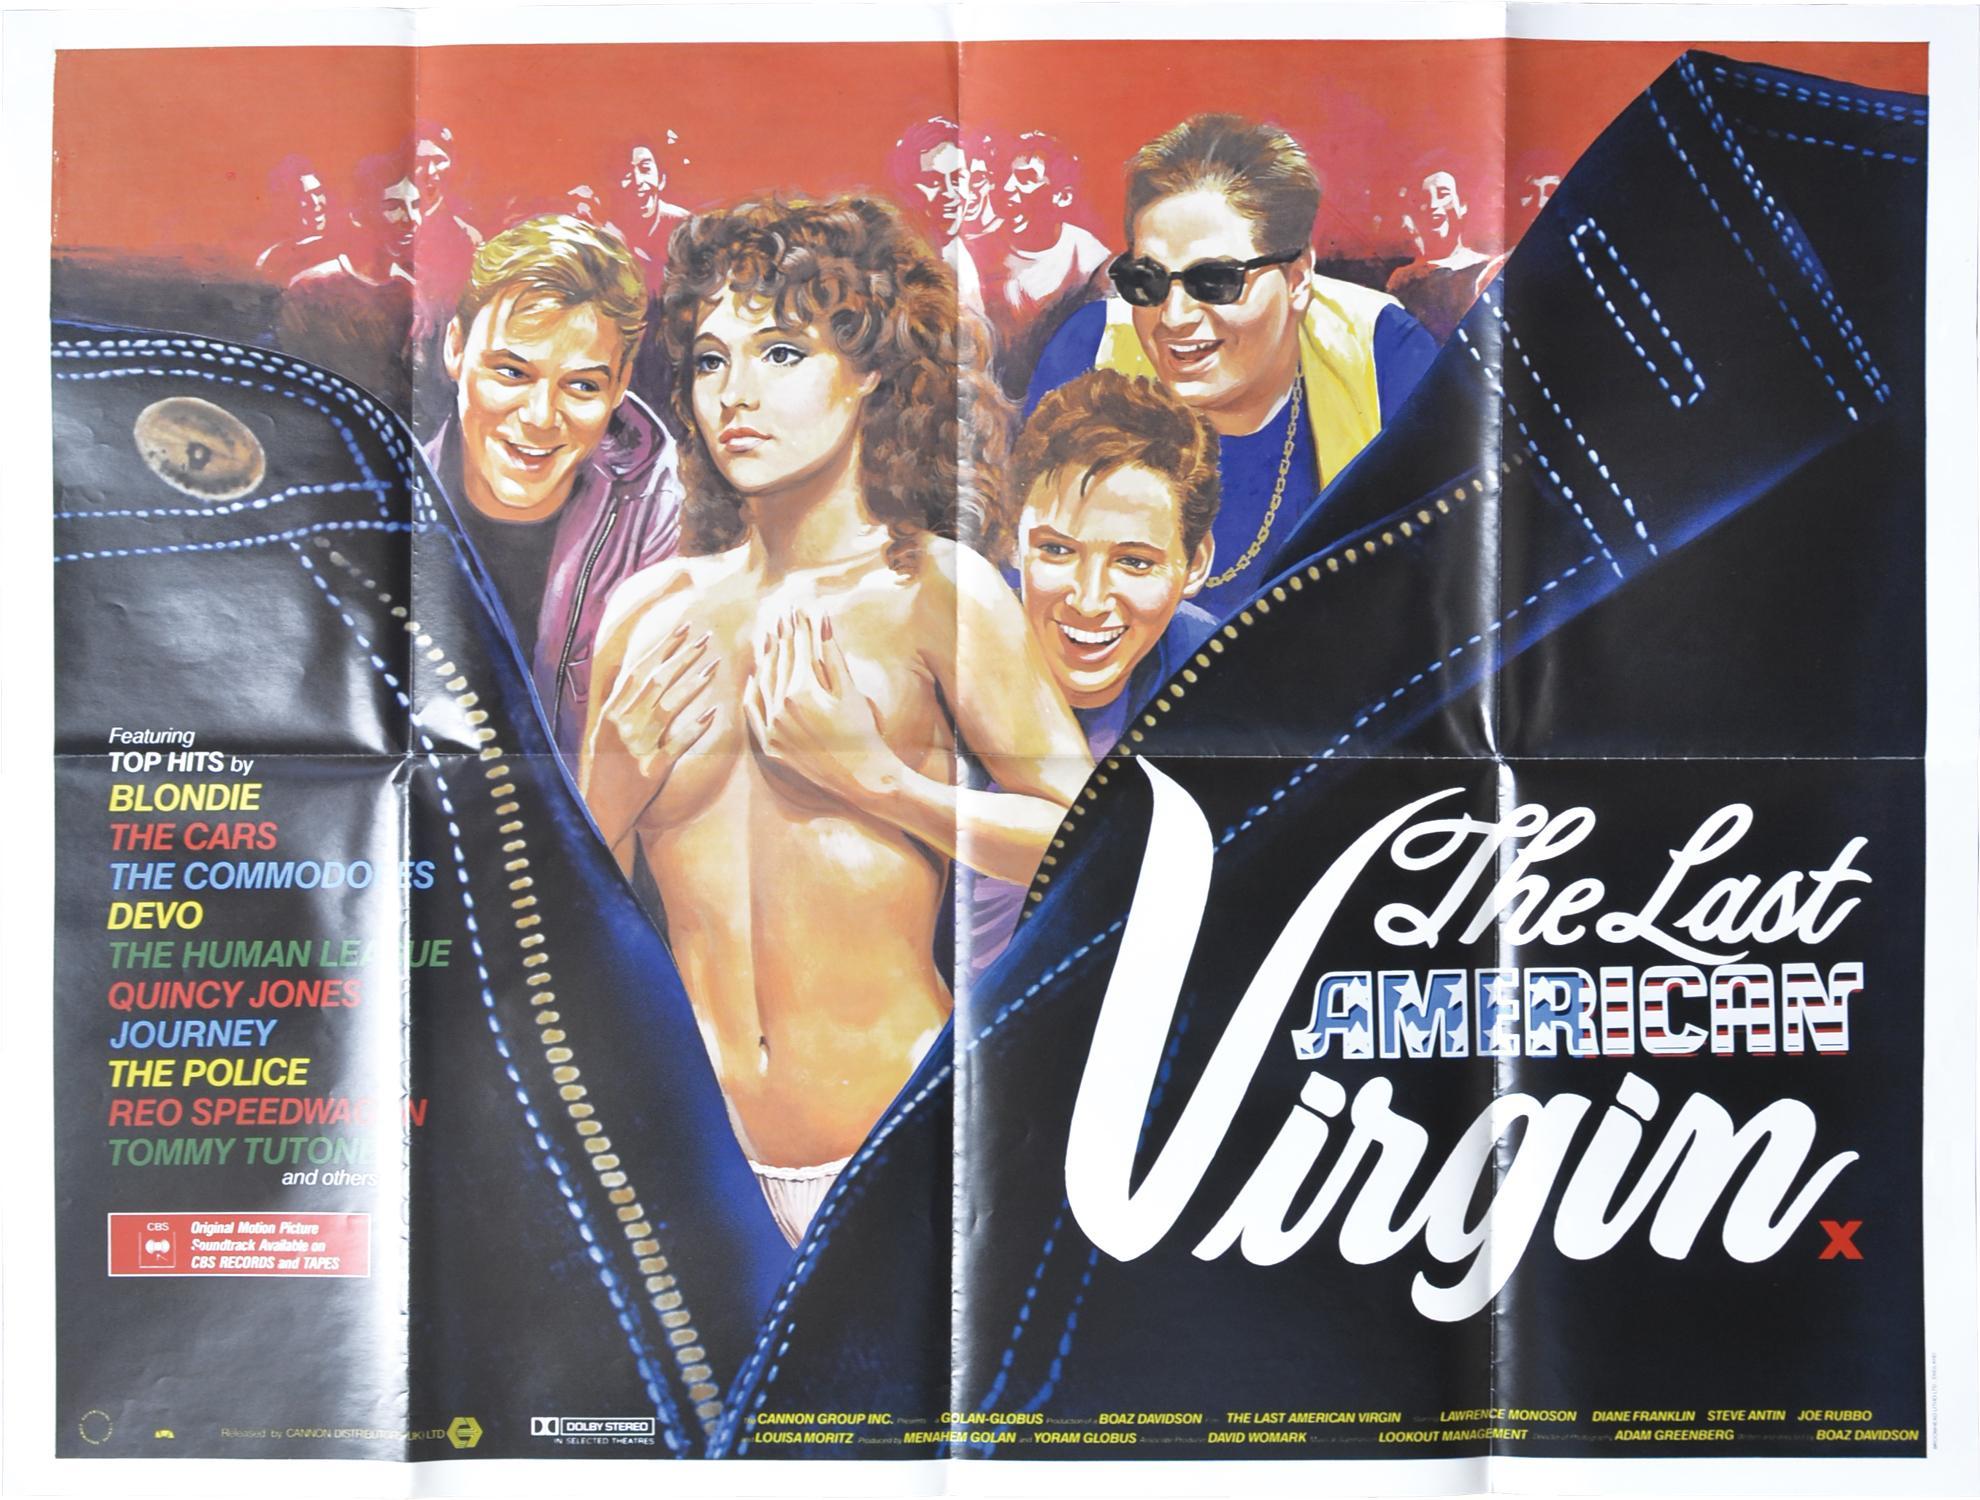 The Last American Virgin (Original British poster for the 1982 film) Davidson, Boaz (director, screenwriter); Lawrence Monoson, Diane Franklin, Steve